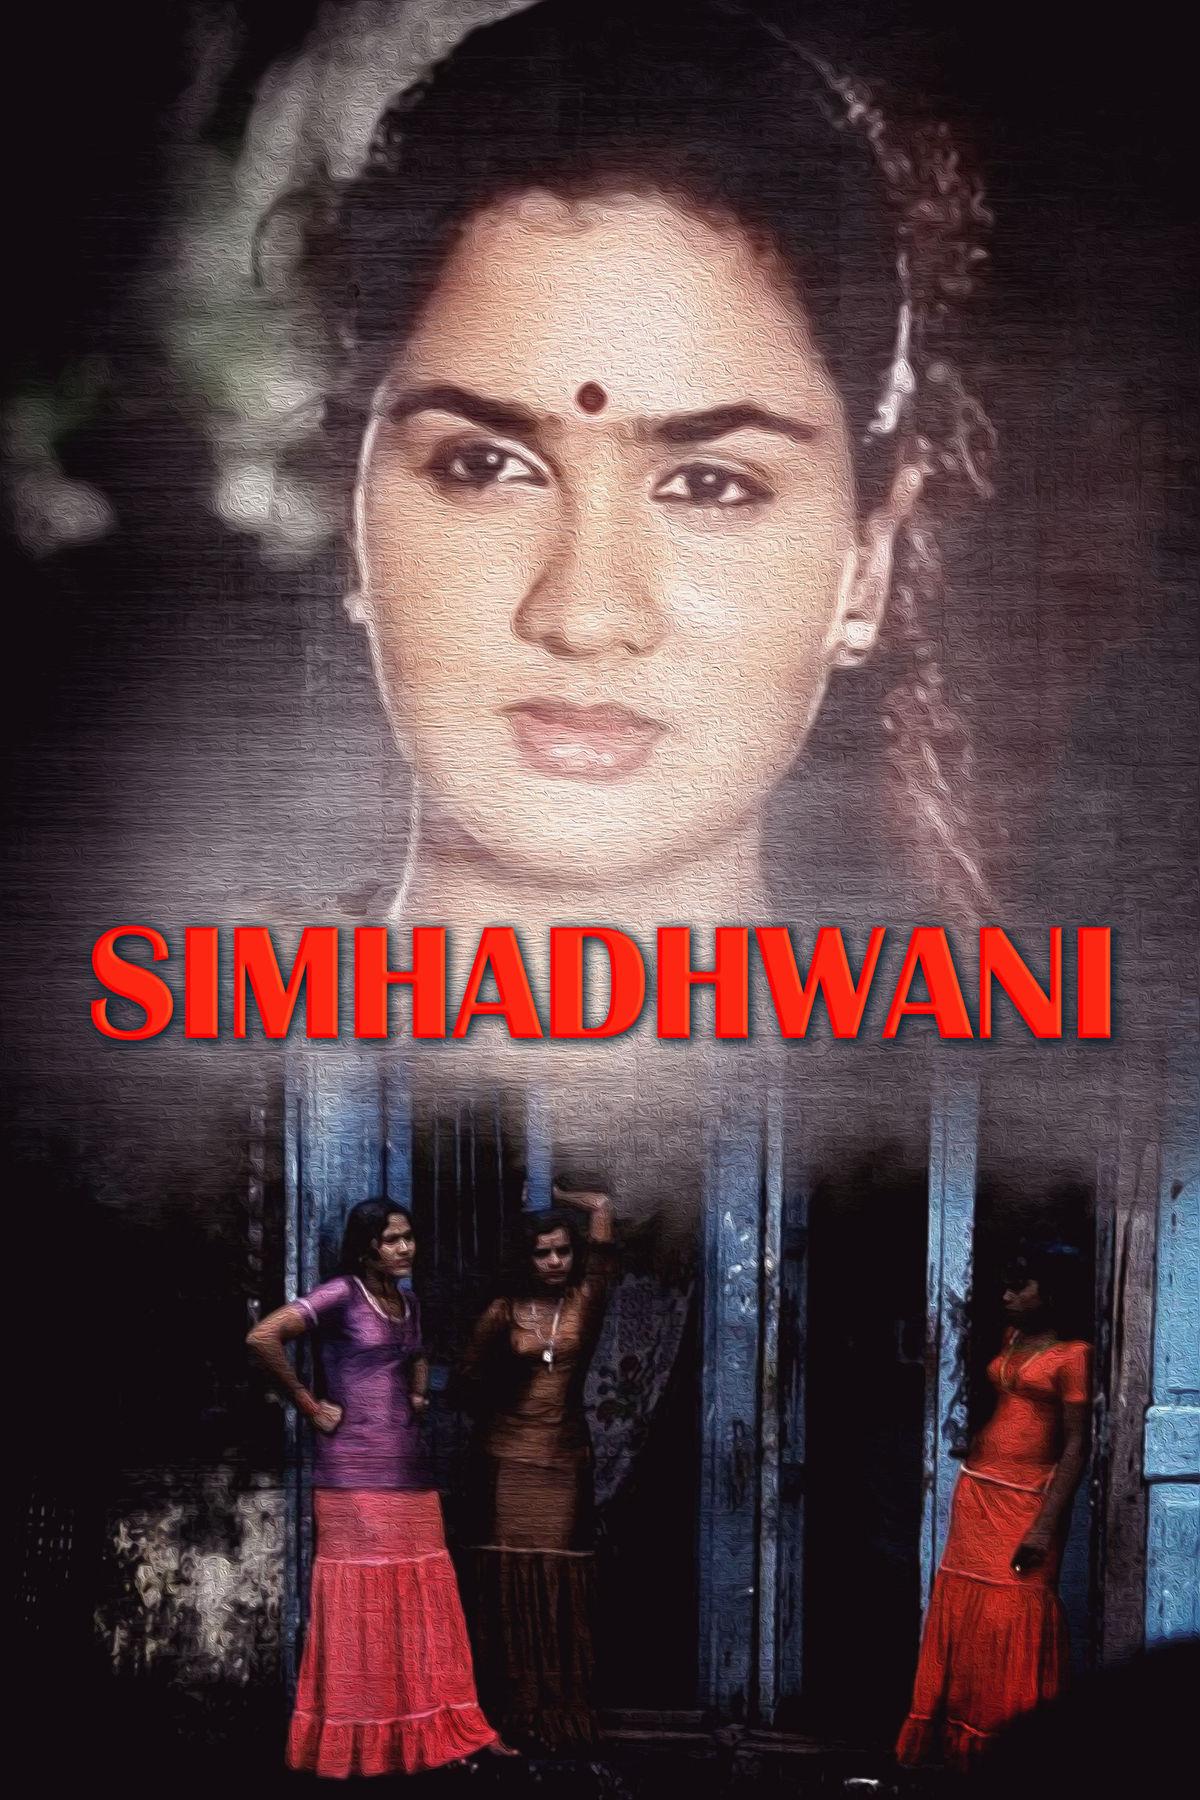 Simhadhwani